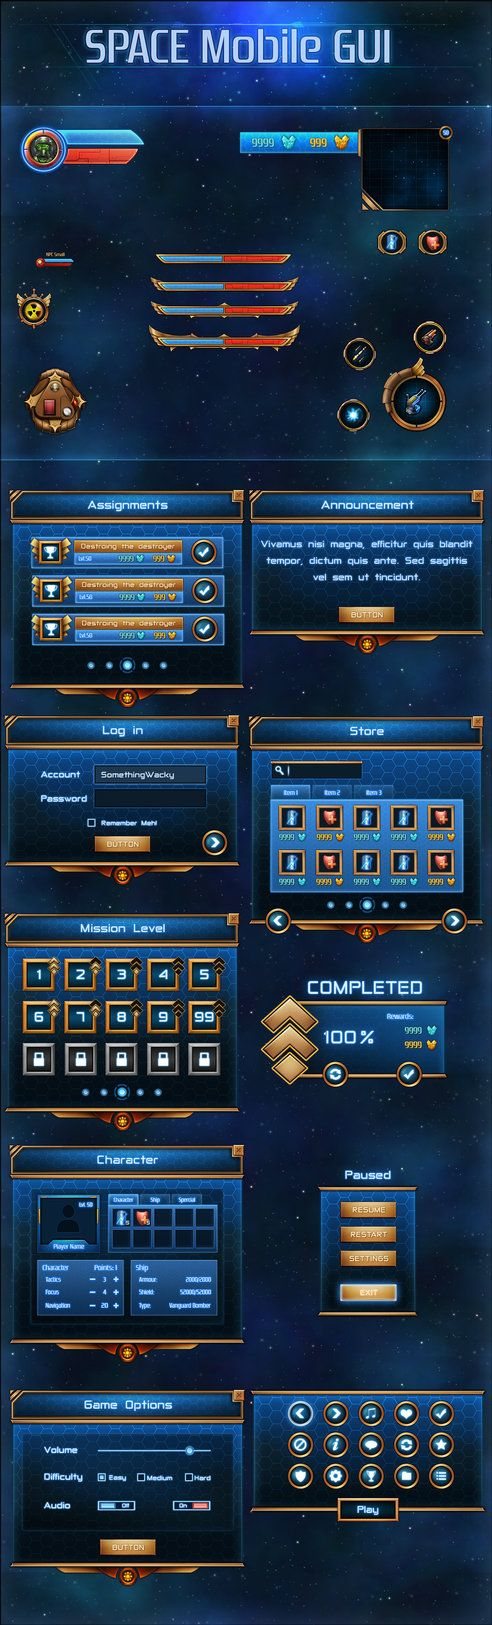 Space Mobile GUI by VengeanceMK1